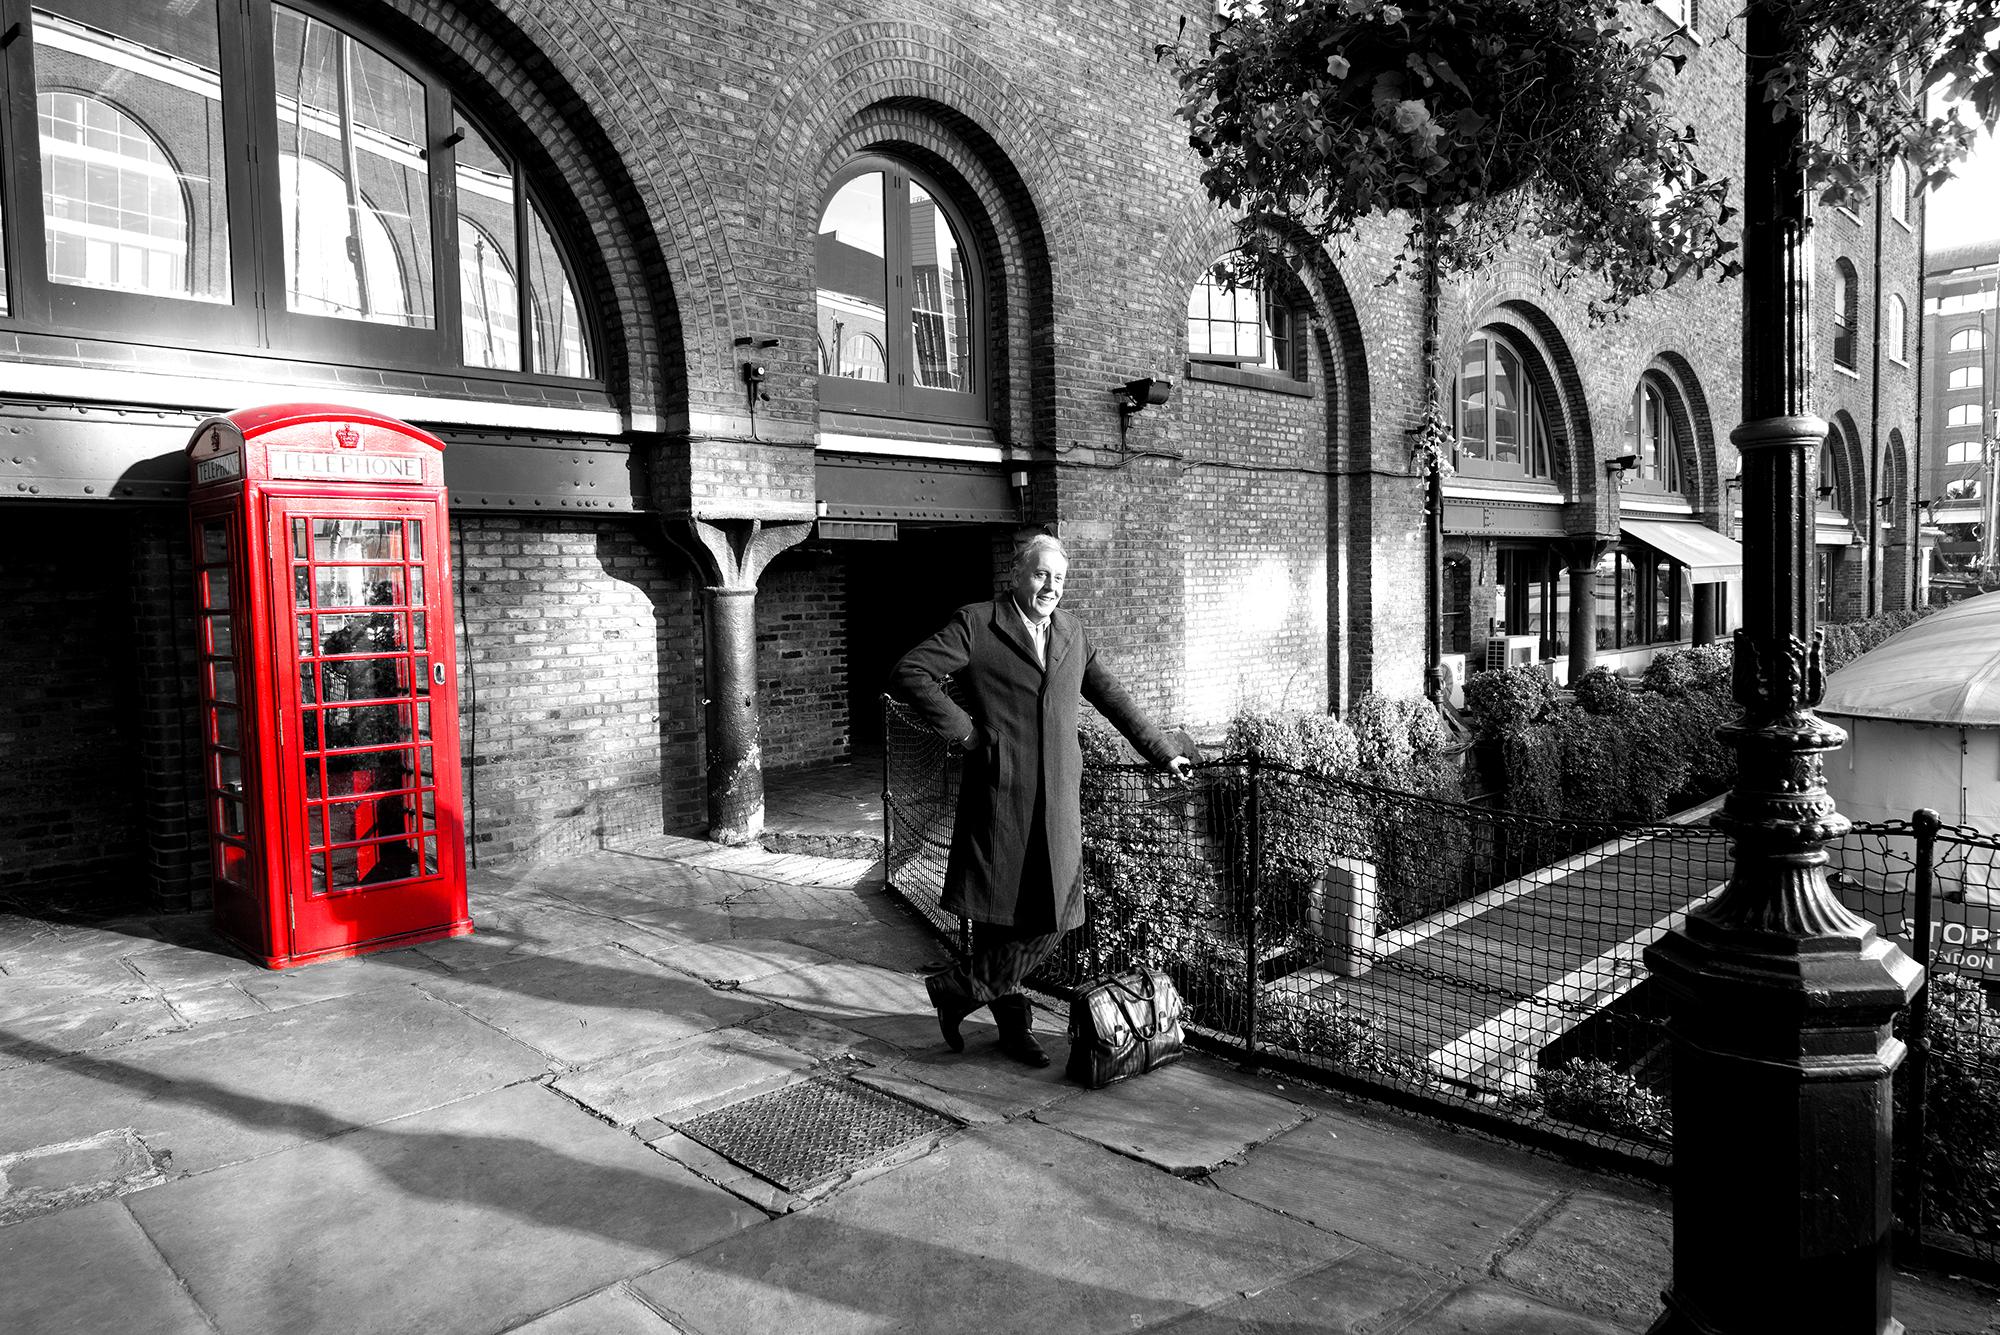 englishman and the phone box